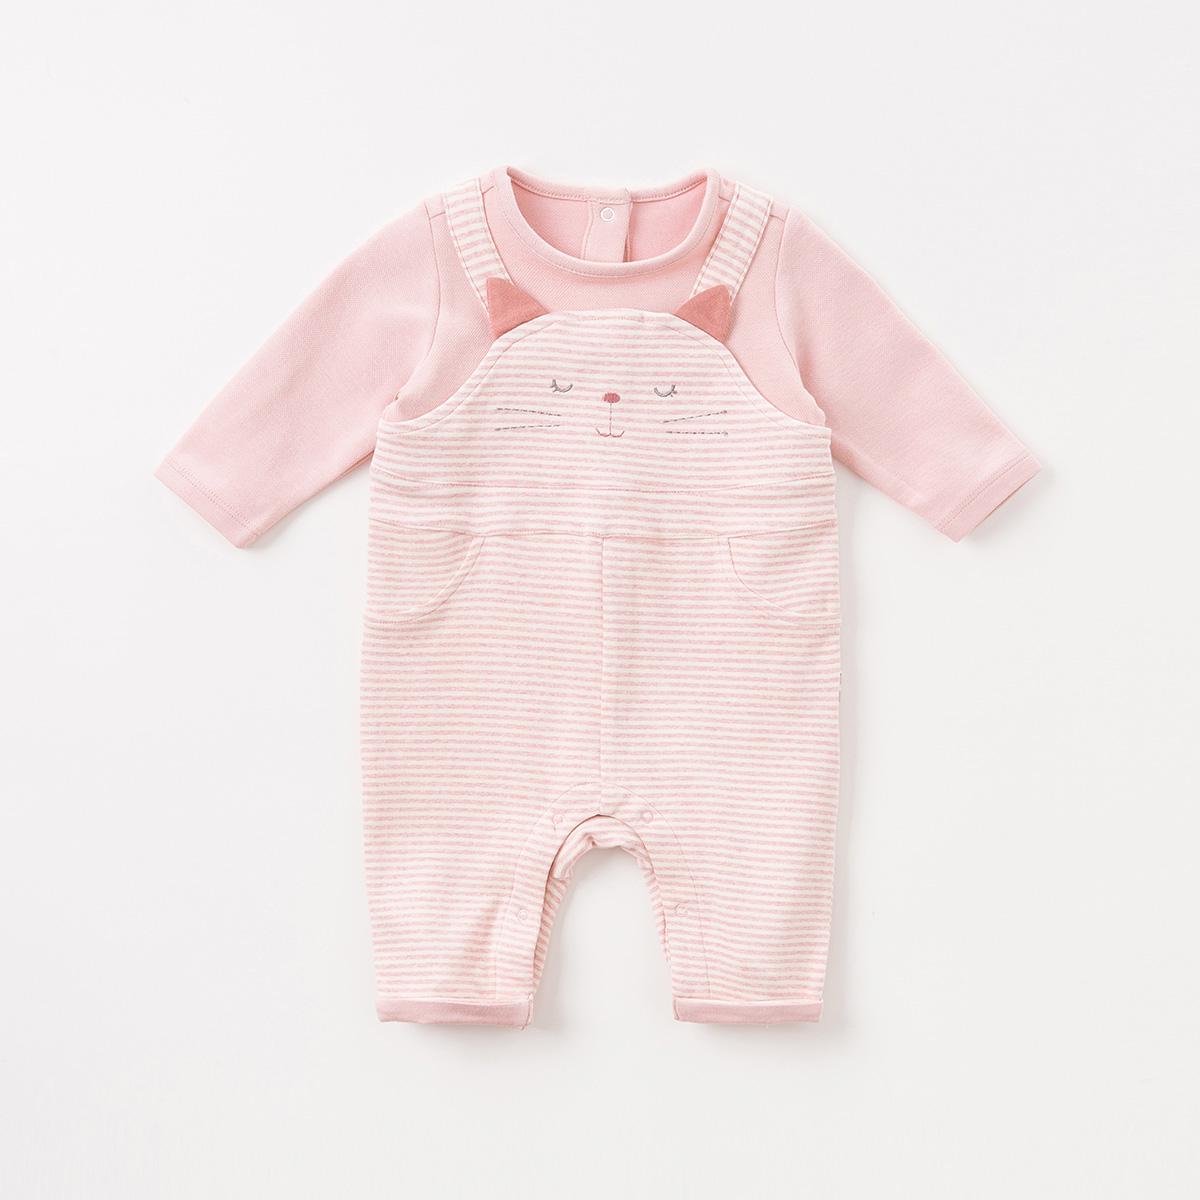 davebella戴维贝拉2018新生儿秋季新款爬服婴幼儿连体衣DBM7758